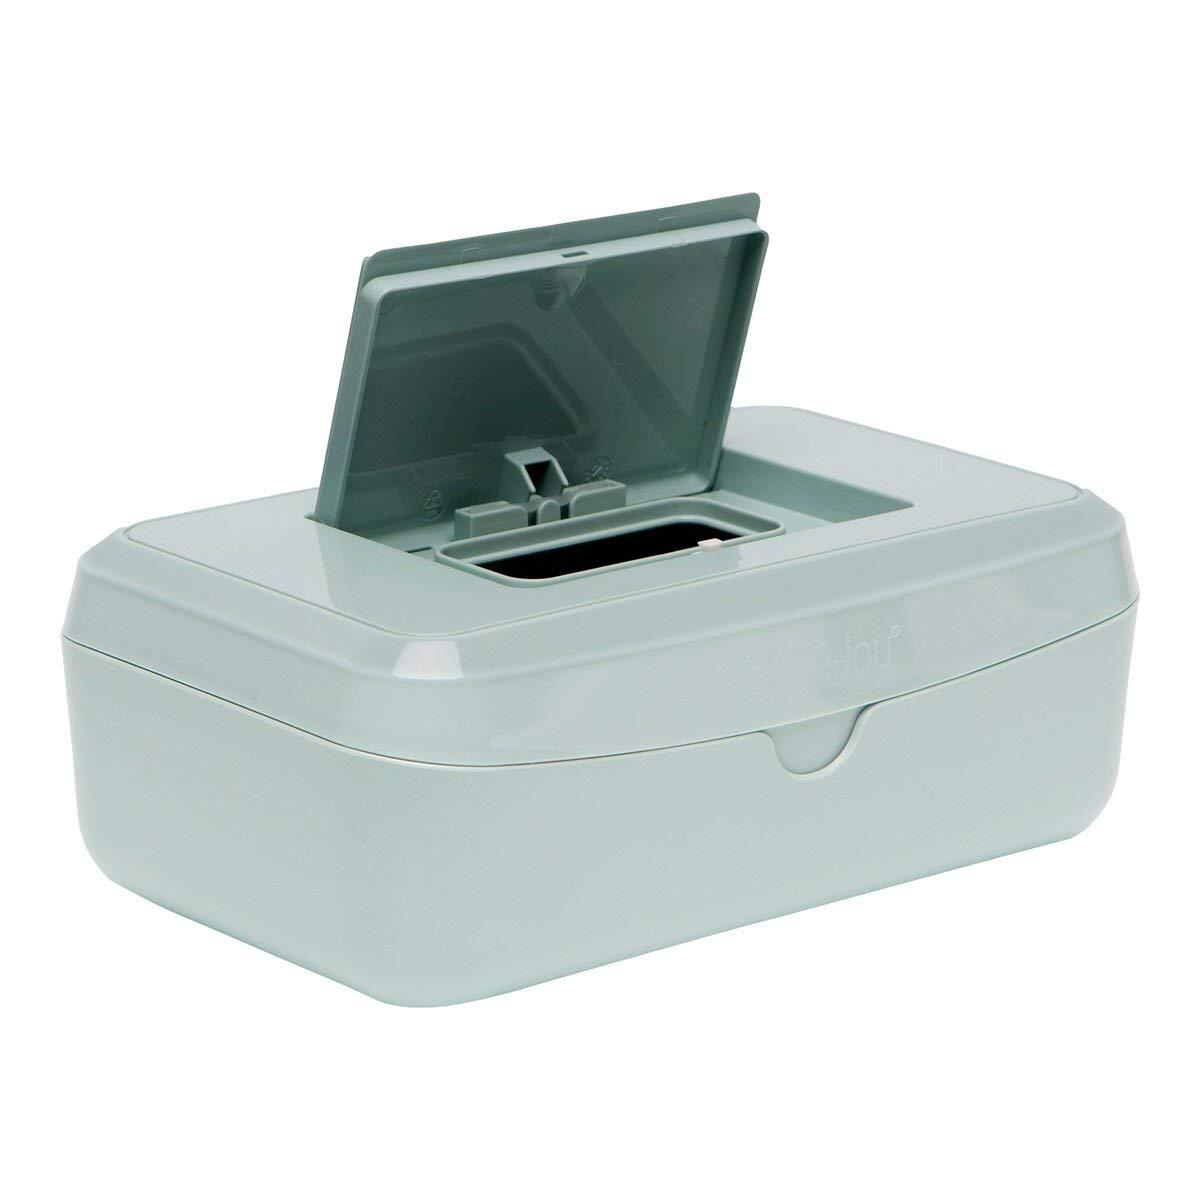 Pink EKKONG Feuchtt/ücher-Box Baby Feuchtt/ücherbox,Aufbewahrungsbox f/ür Feuchtt/ücher Baby T/ücher Fall Toilettenpapier Box Taschentuchhalter Kunststoff Feuchtt/ücher Spender T/ücherbox Serviettenbox